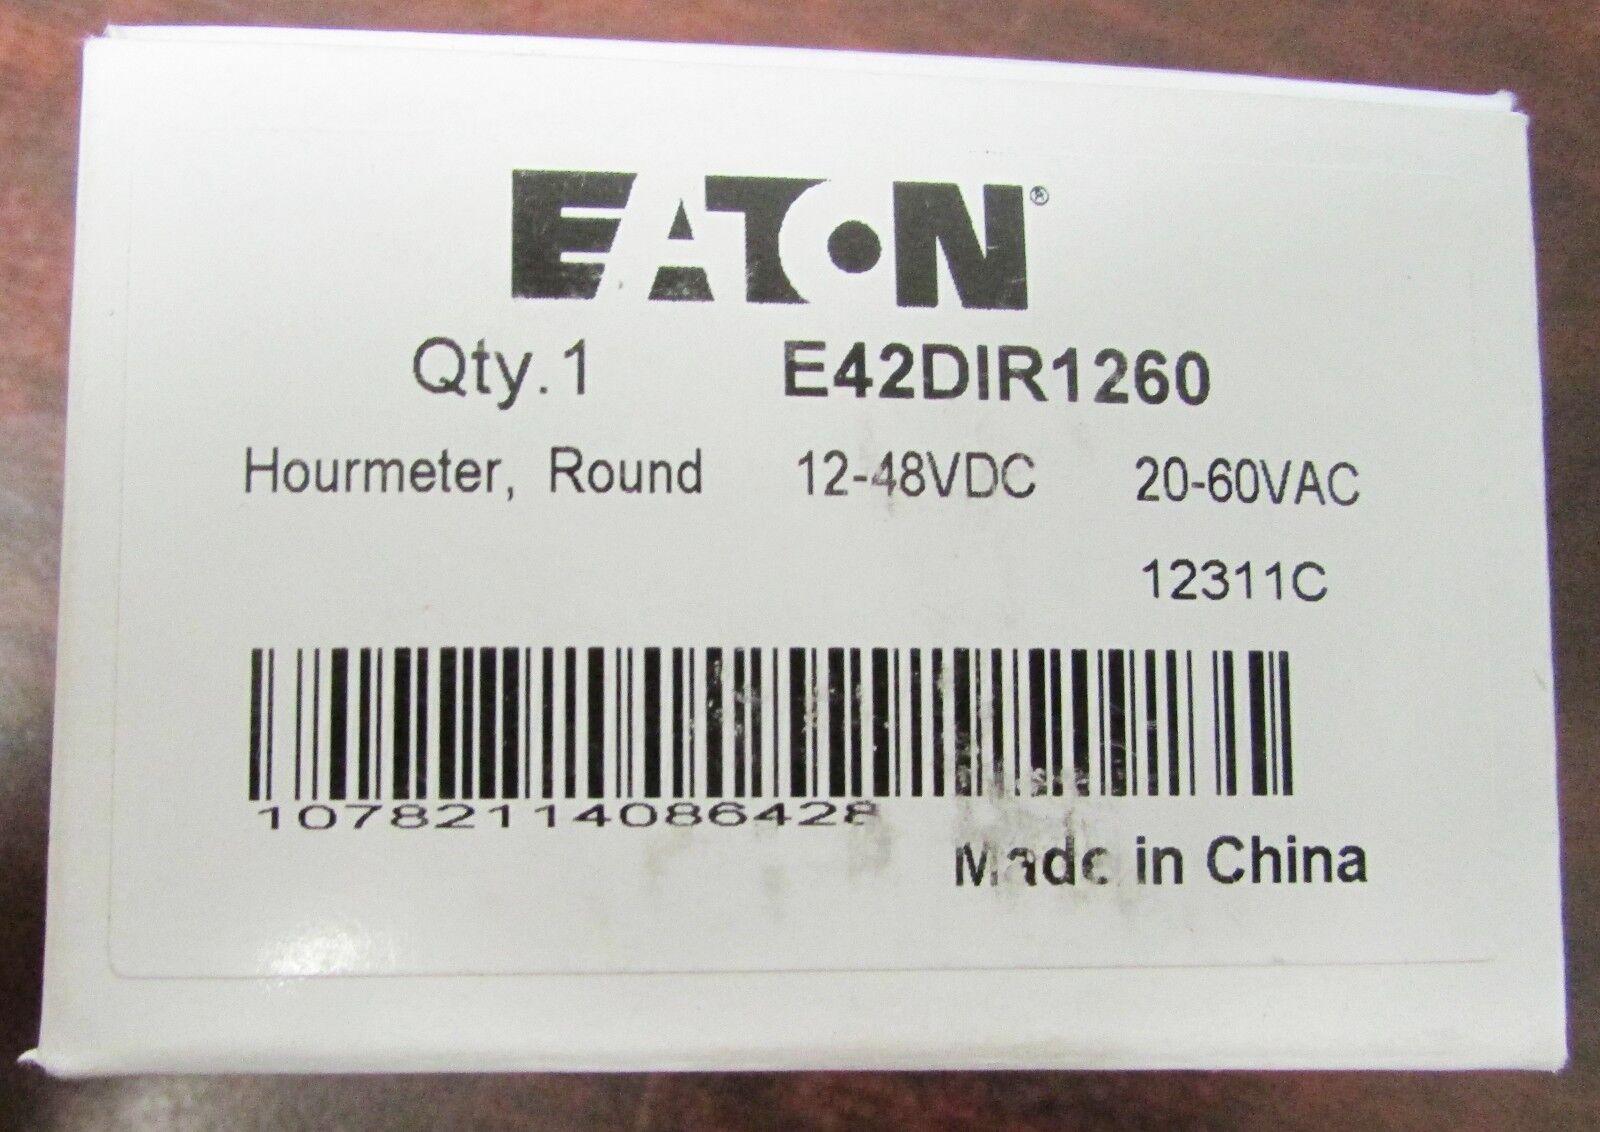 EATON E42DIR1260 CURTIS 53017 12-48VDC 20-60VAC Hourmeter Timer 12311C